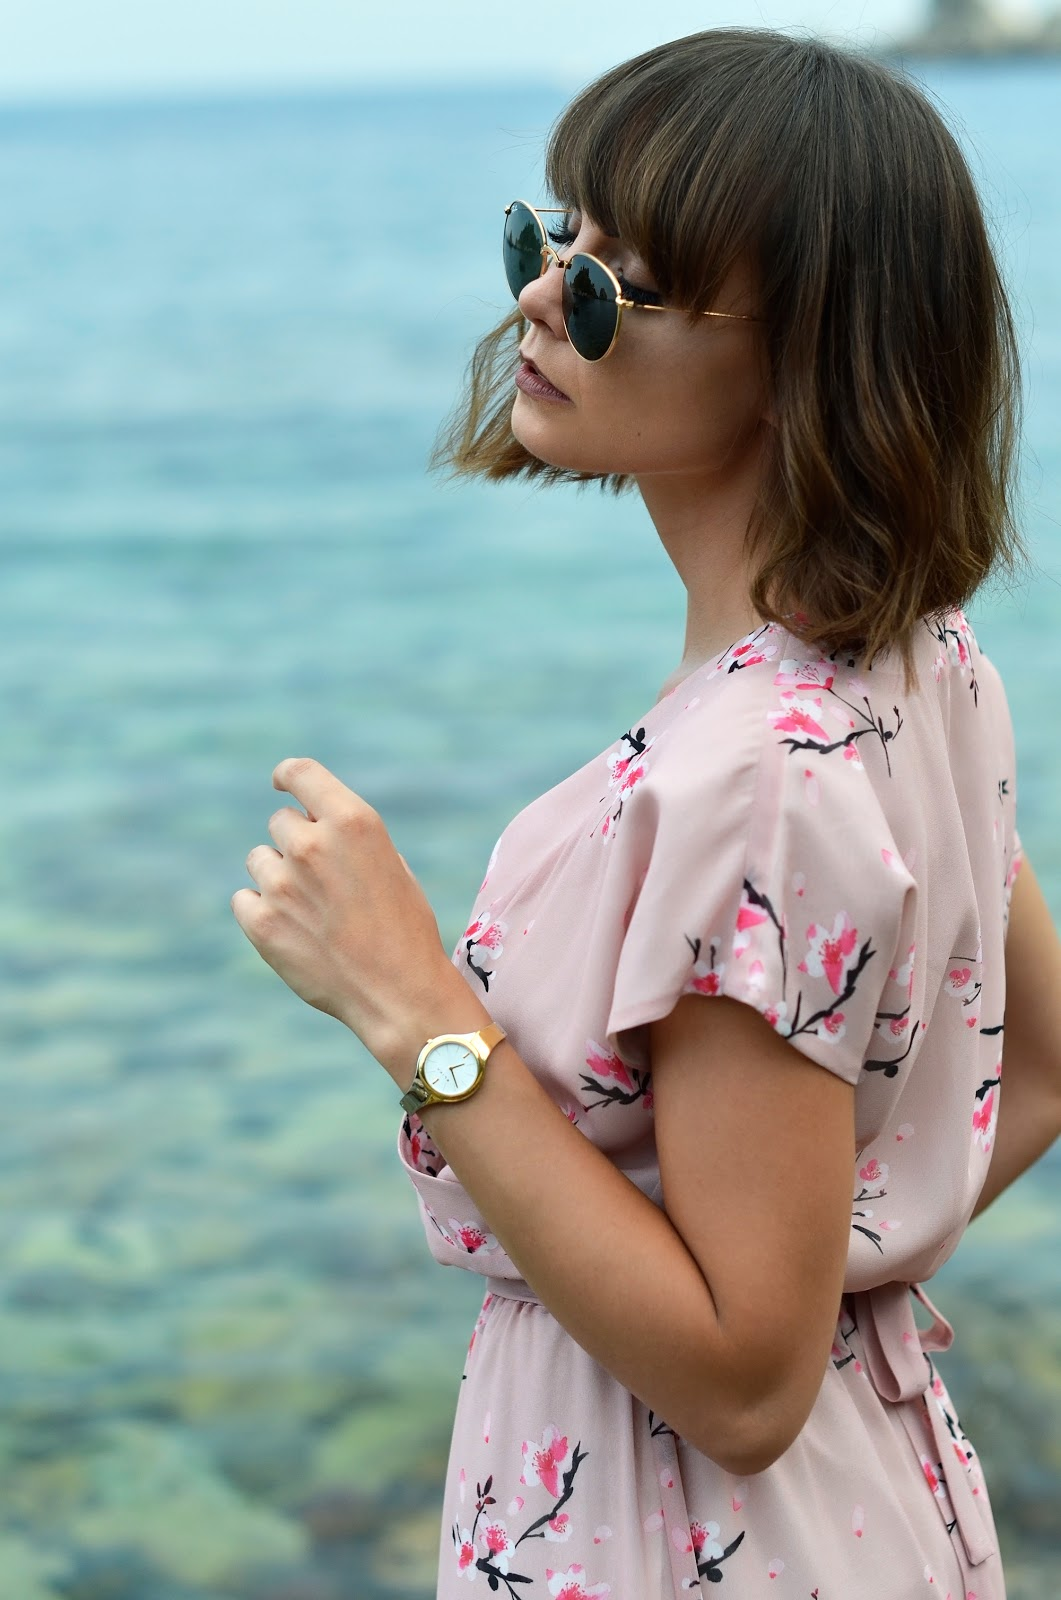 wakacje | sycylia | messo butik | apart | elixa | zegarek | uroda | moda